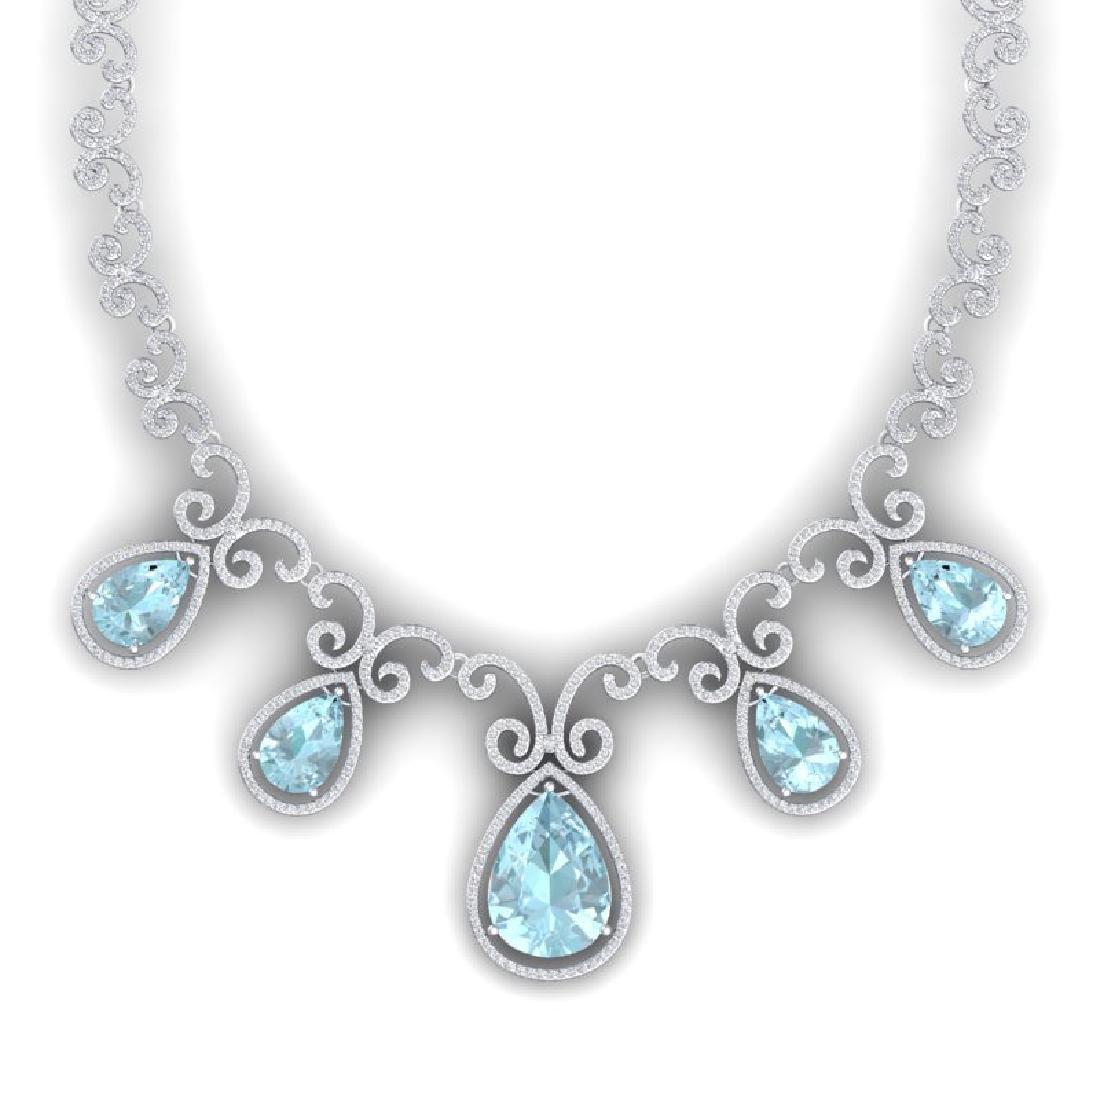 40.45 CTW Royalty Sky Topaz & VS Diamond Necklace 18K